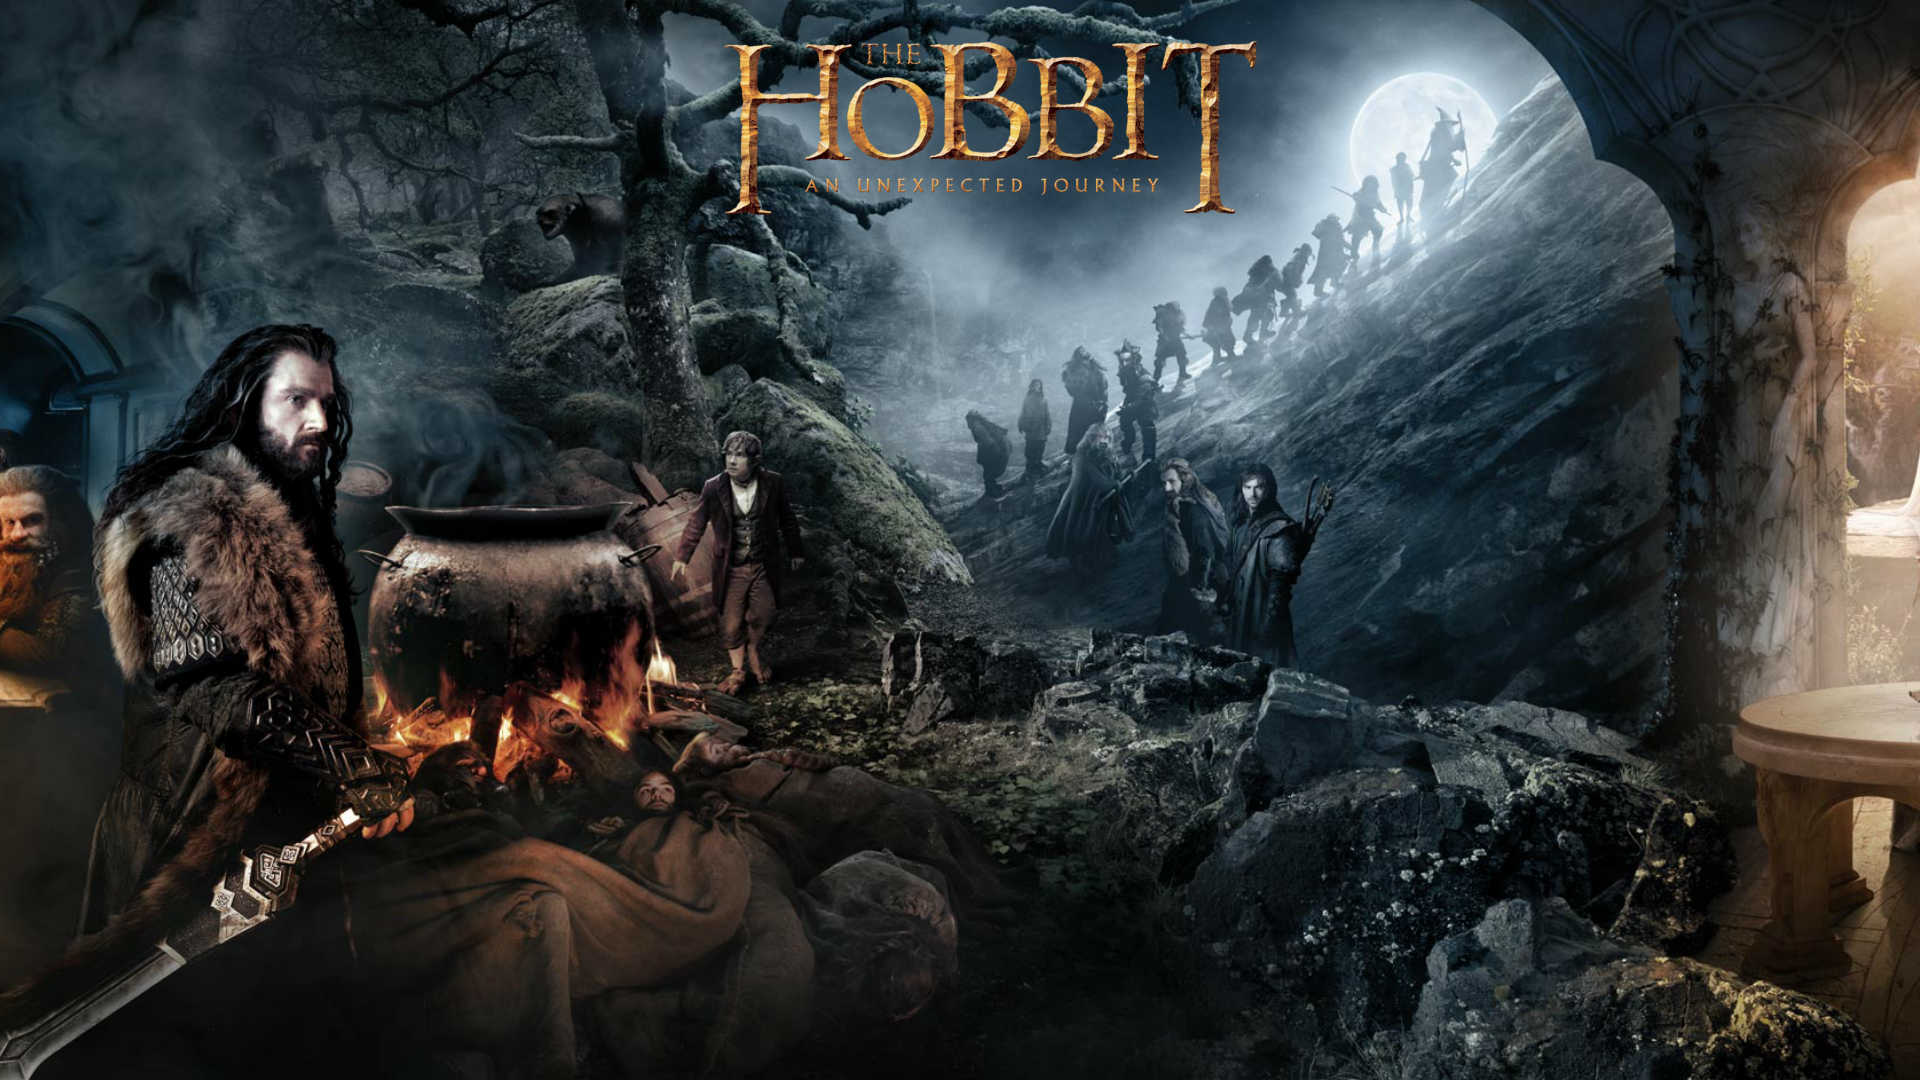 The Hobbit Wallpaper   The Hobbit Wallpaper 33042231 1920x1080